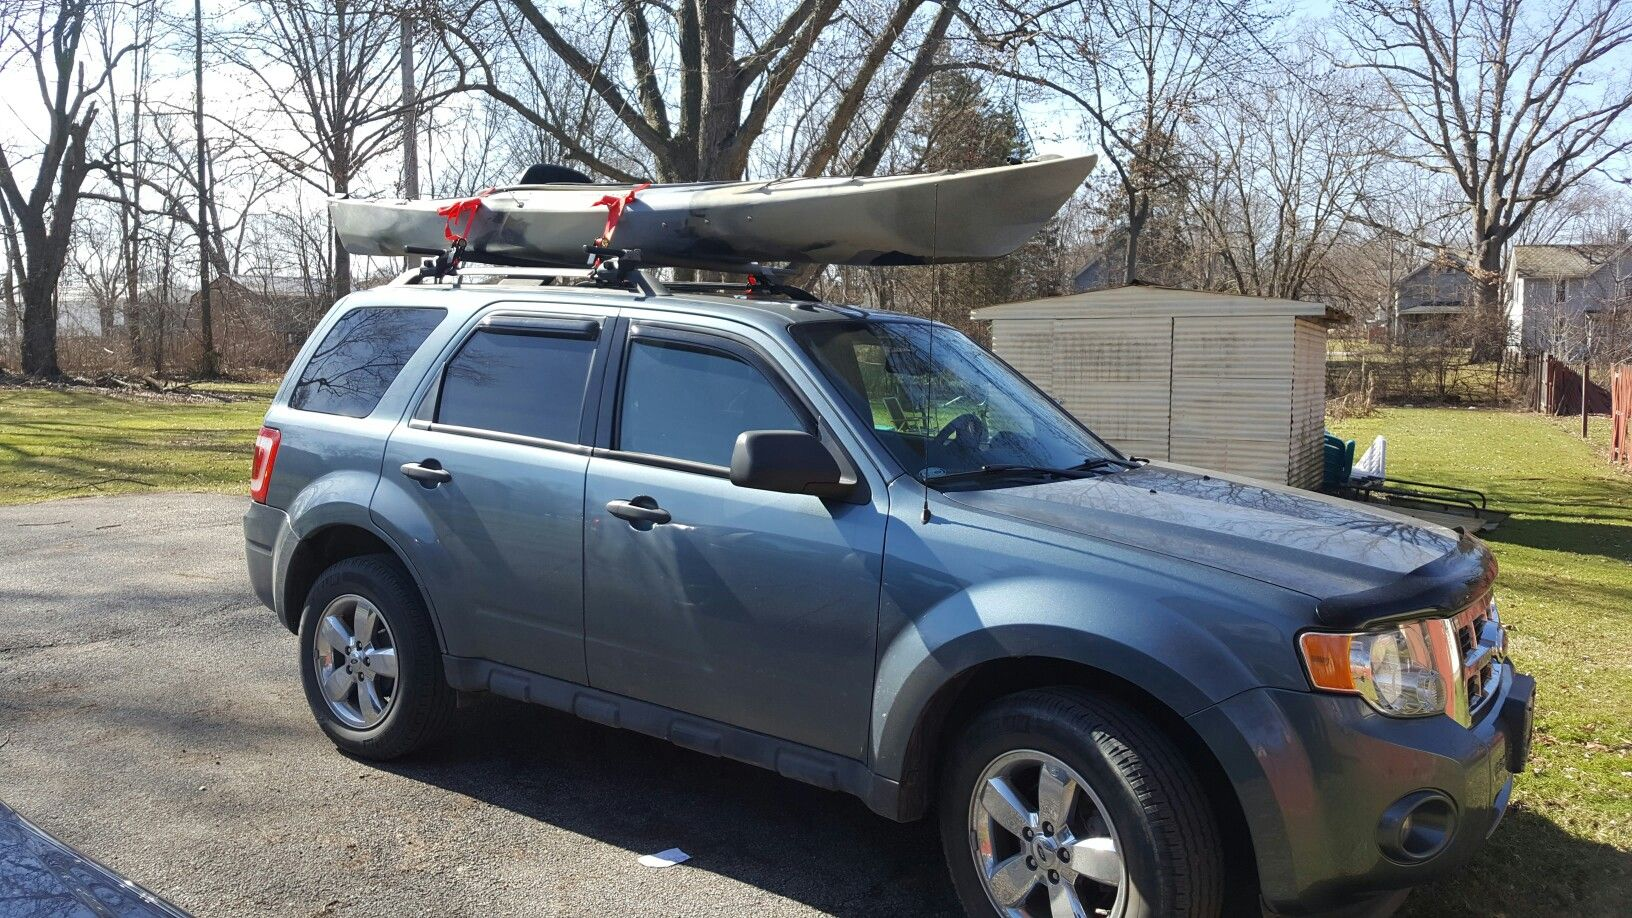 My New Kayak Field And Stream Eagle Run 12 Foot Kayak Kayaking Suv Suv Car